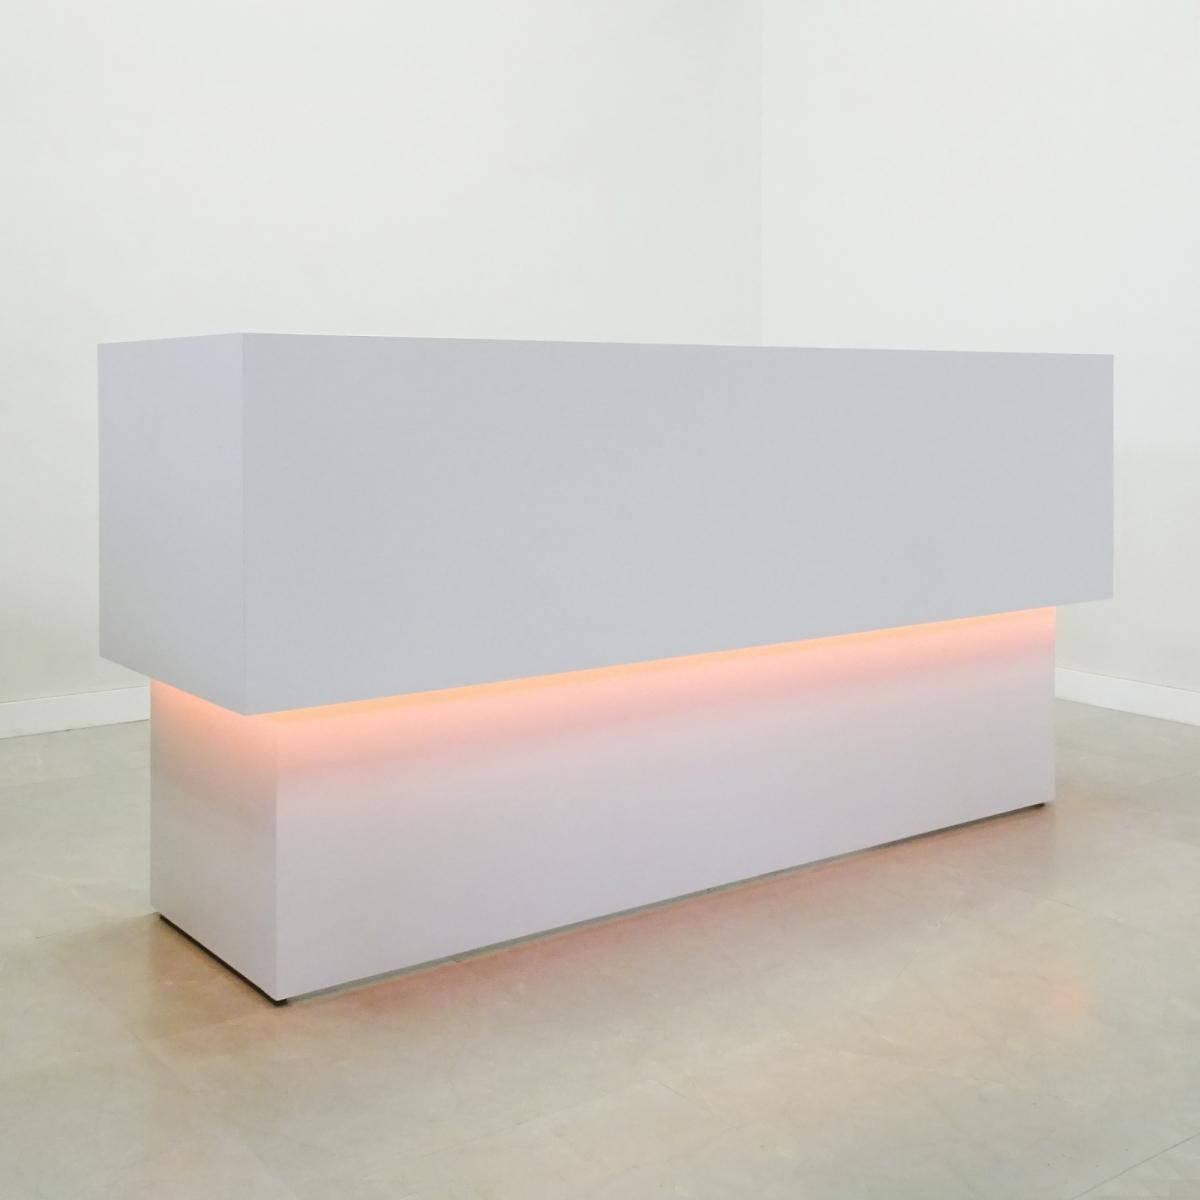 92 In. San Francisco U-Shape Reception Desk White Gloss Laminate